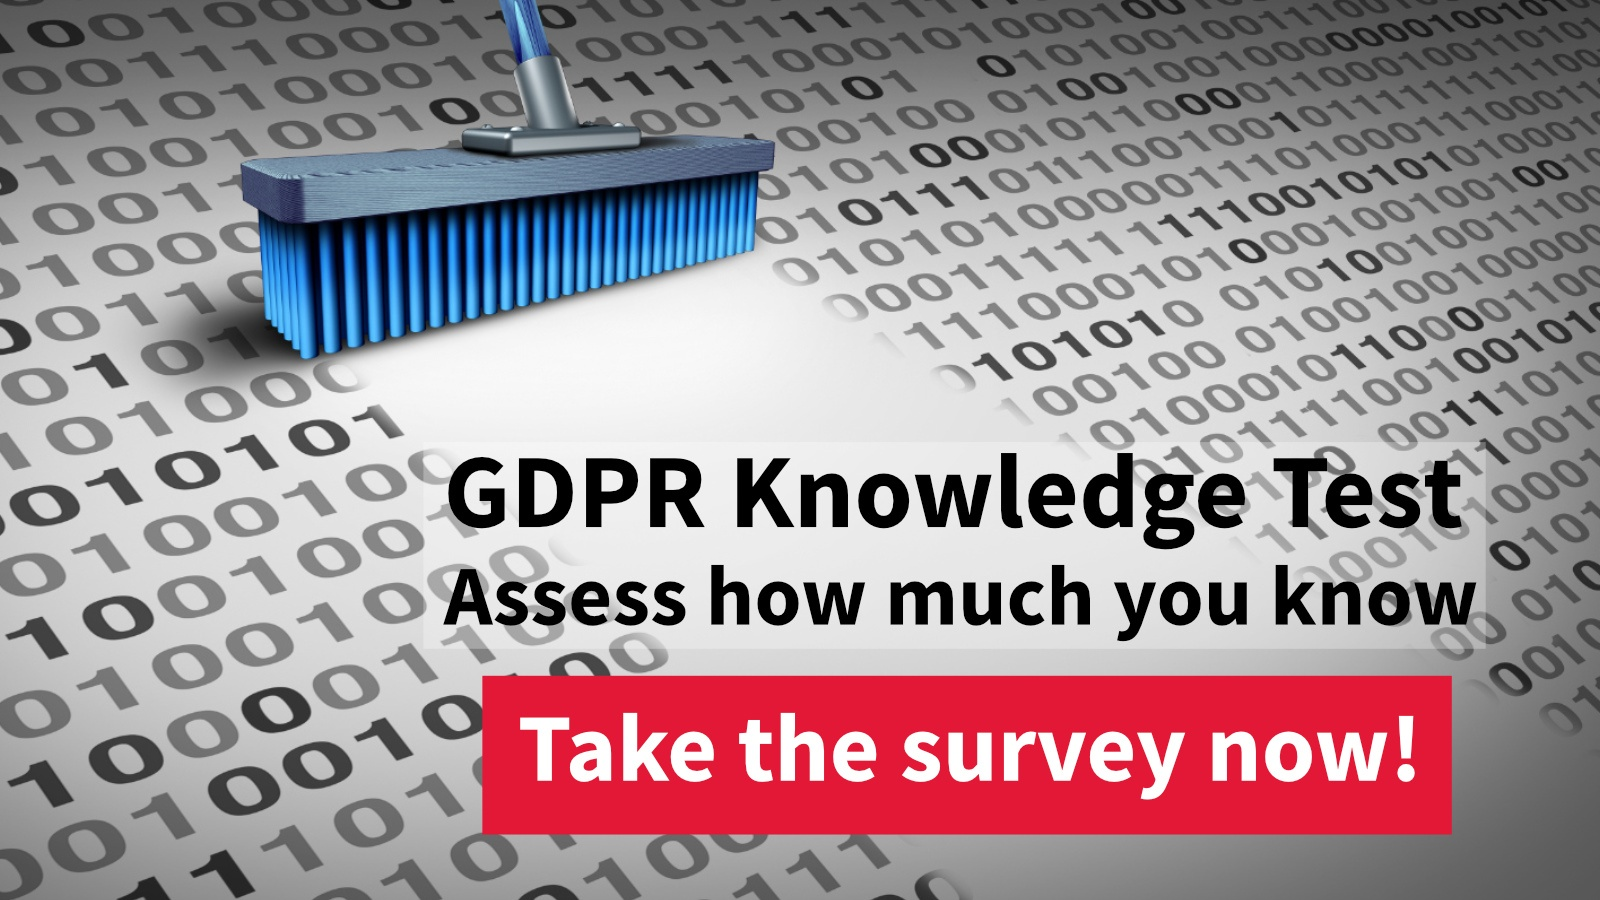 GDPR_Knowledge_Test1